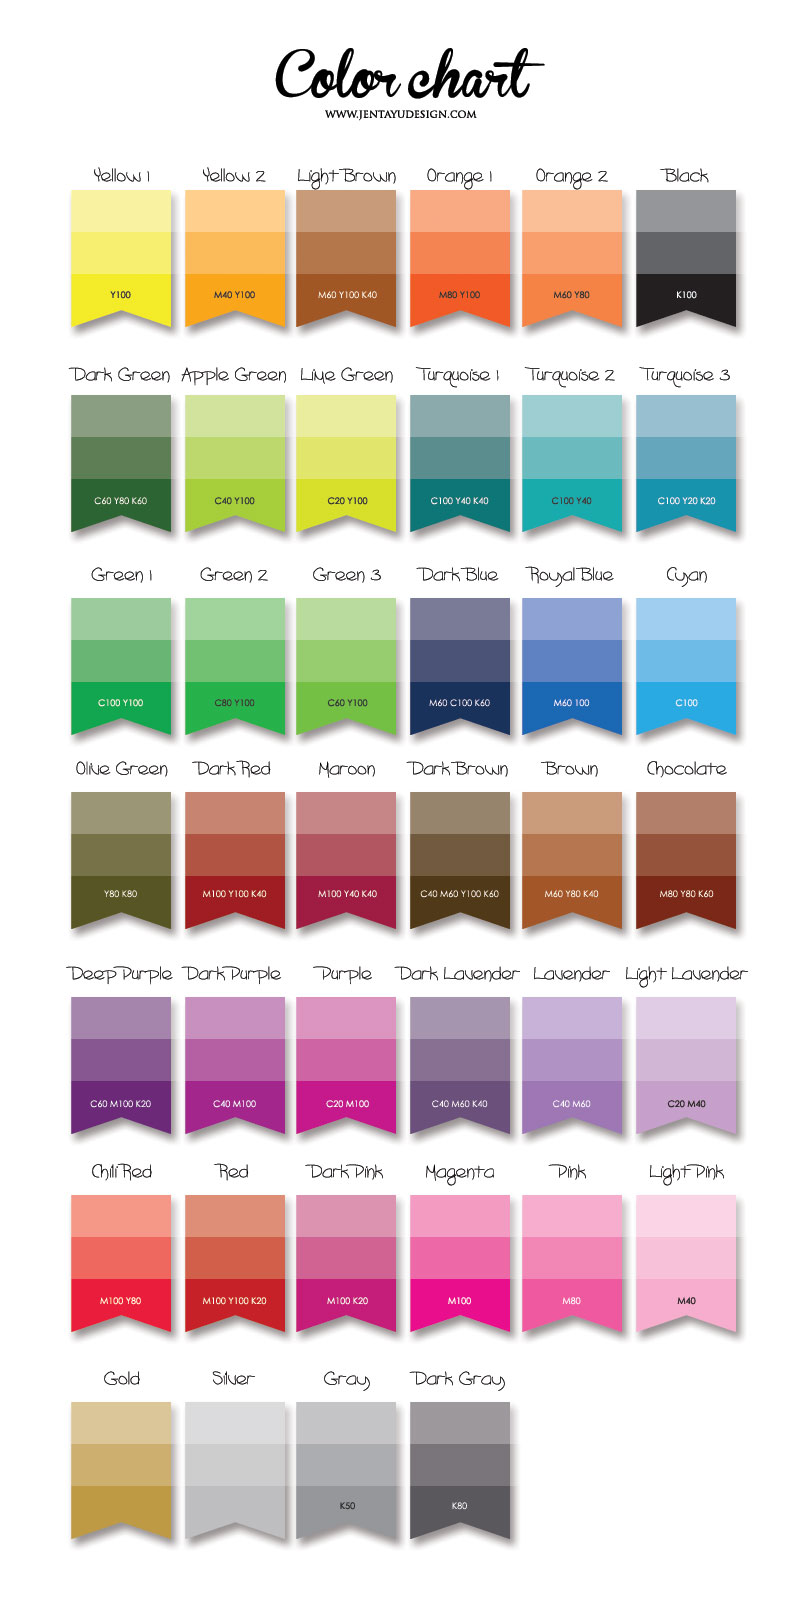 kad kahwin jentayu design 1 colour chart